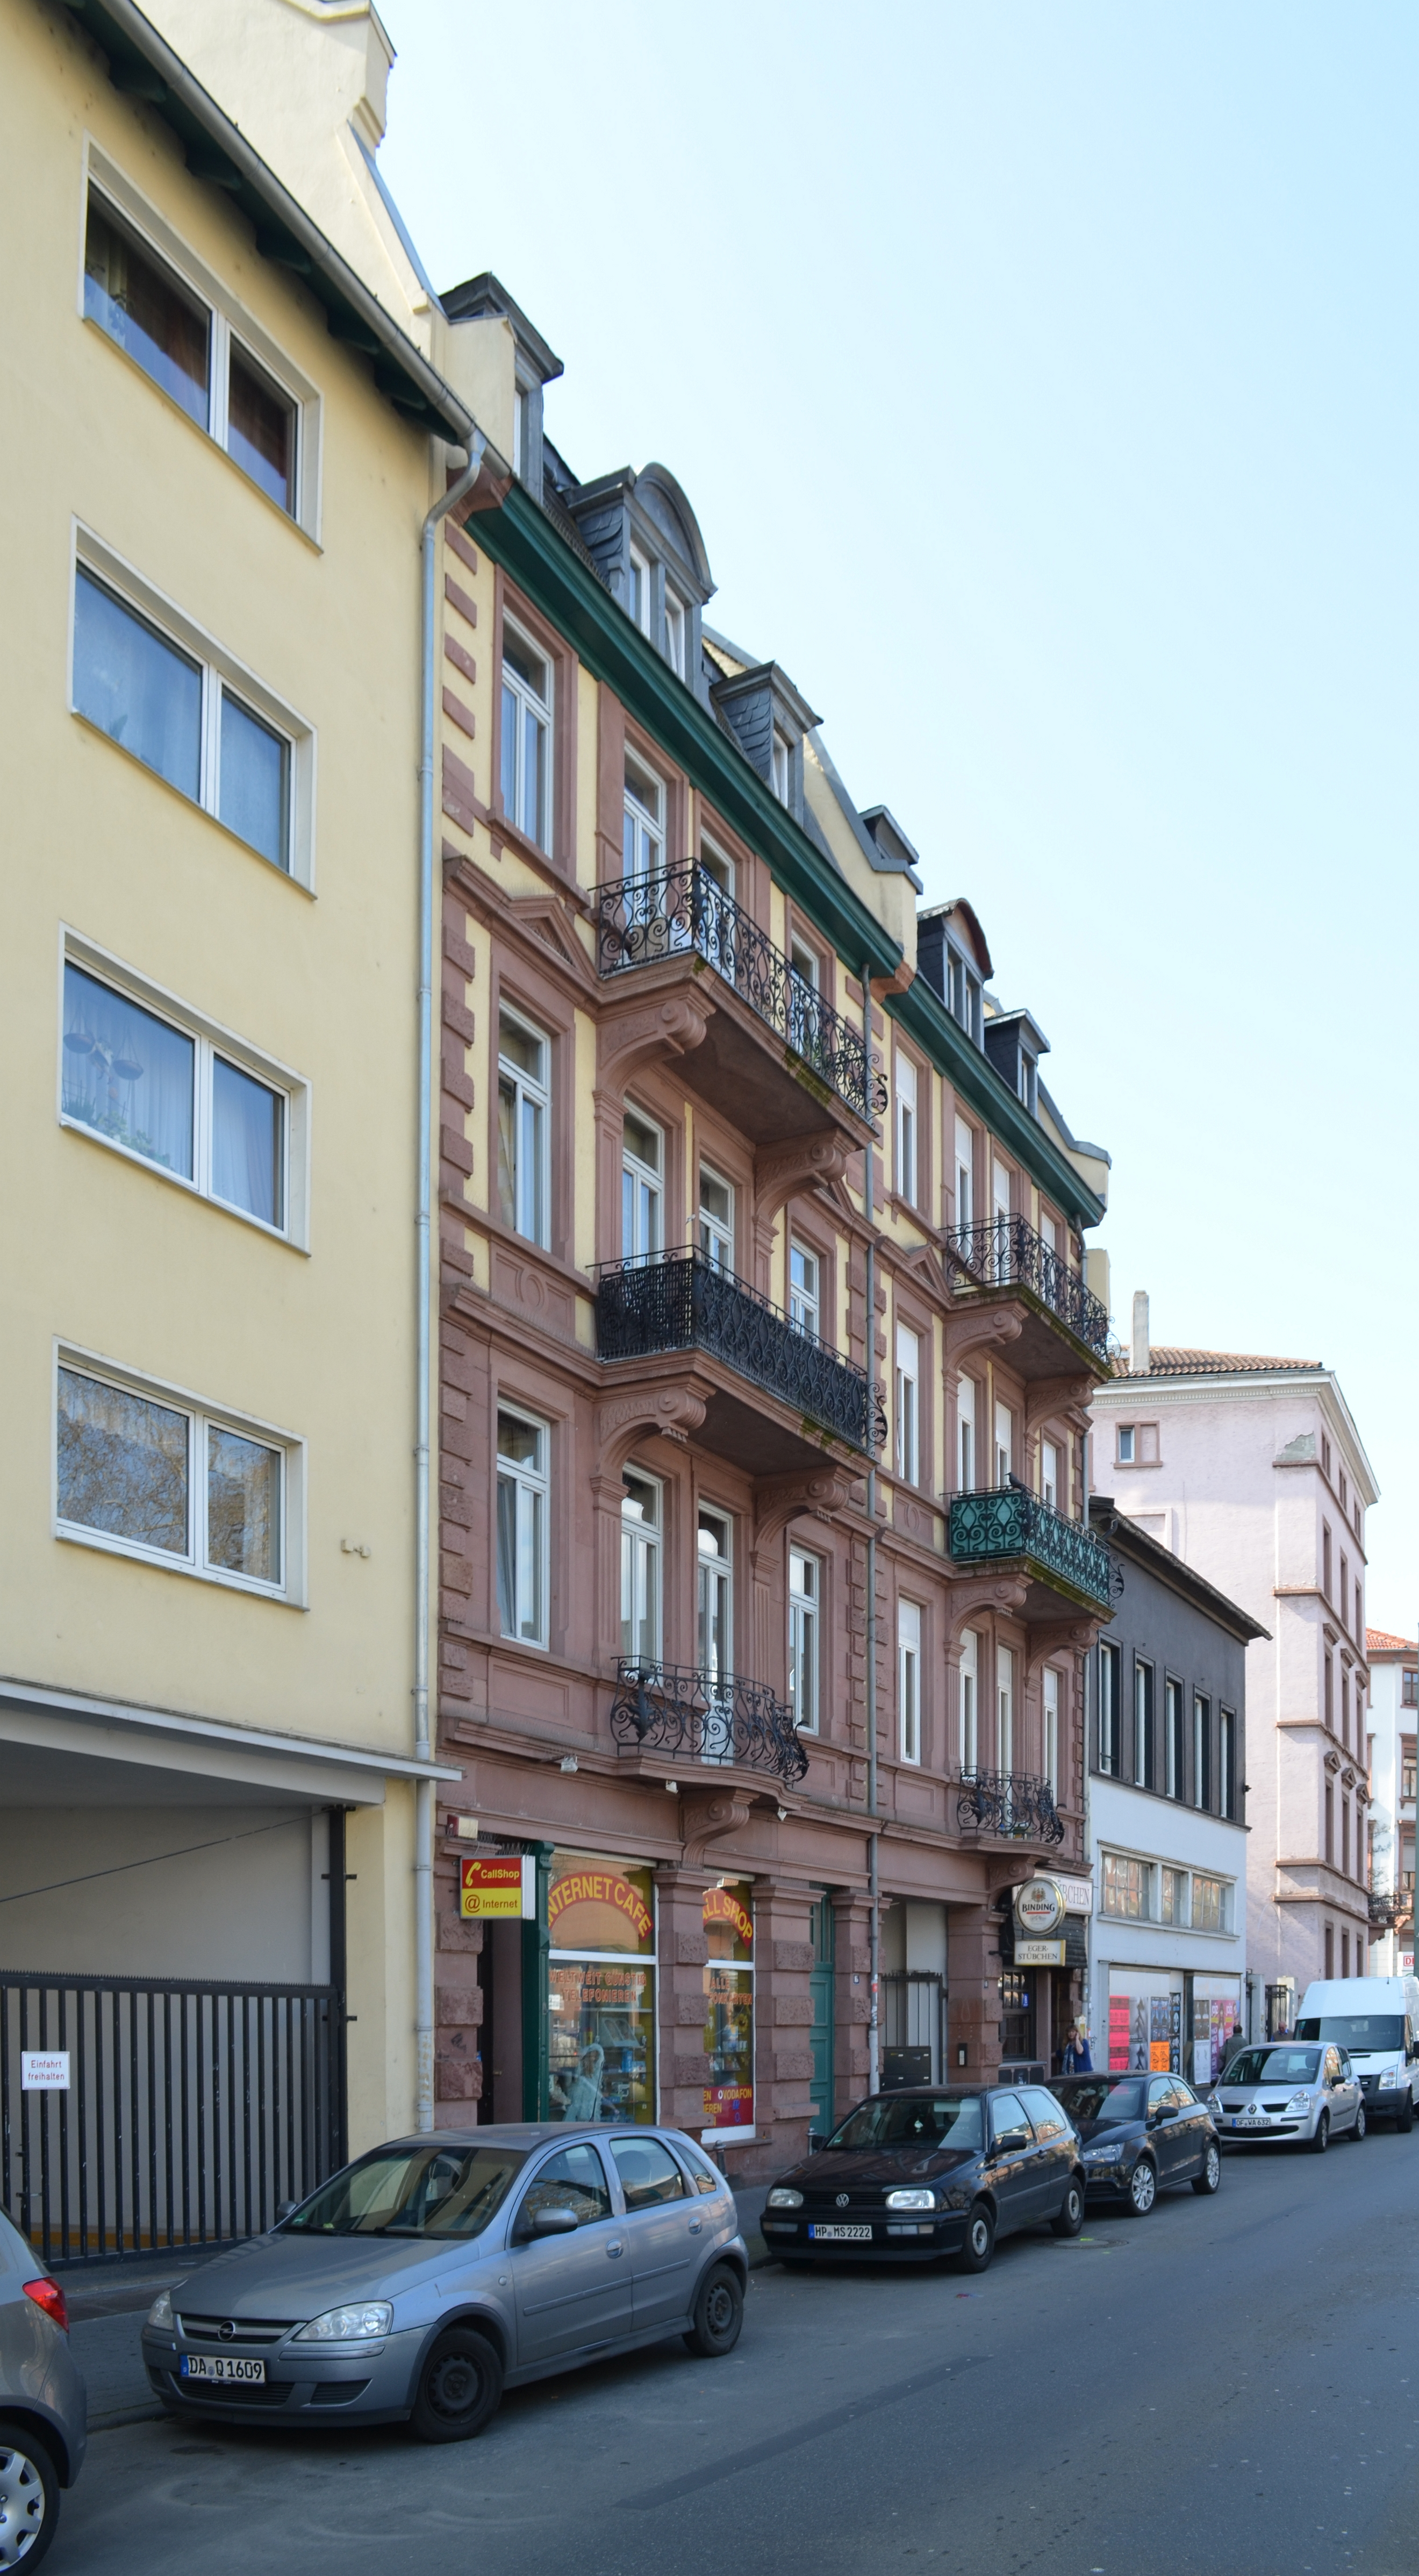 B Und B Hotel Frankfurt Hanauer Landstra Ef Bf Bde